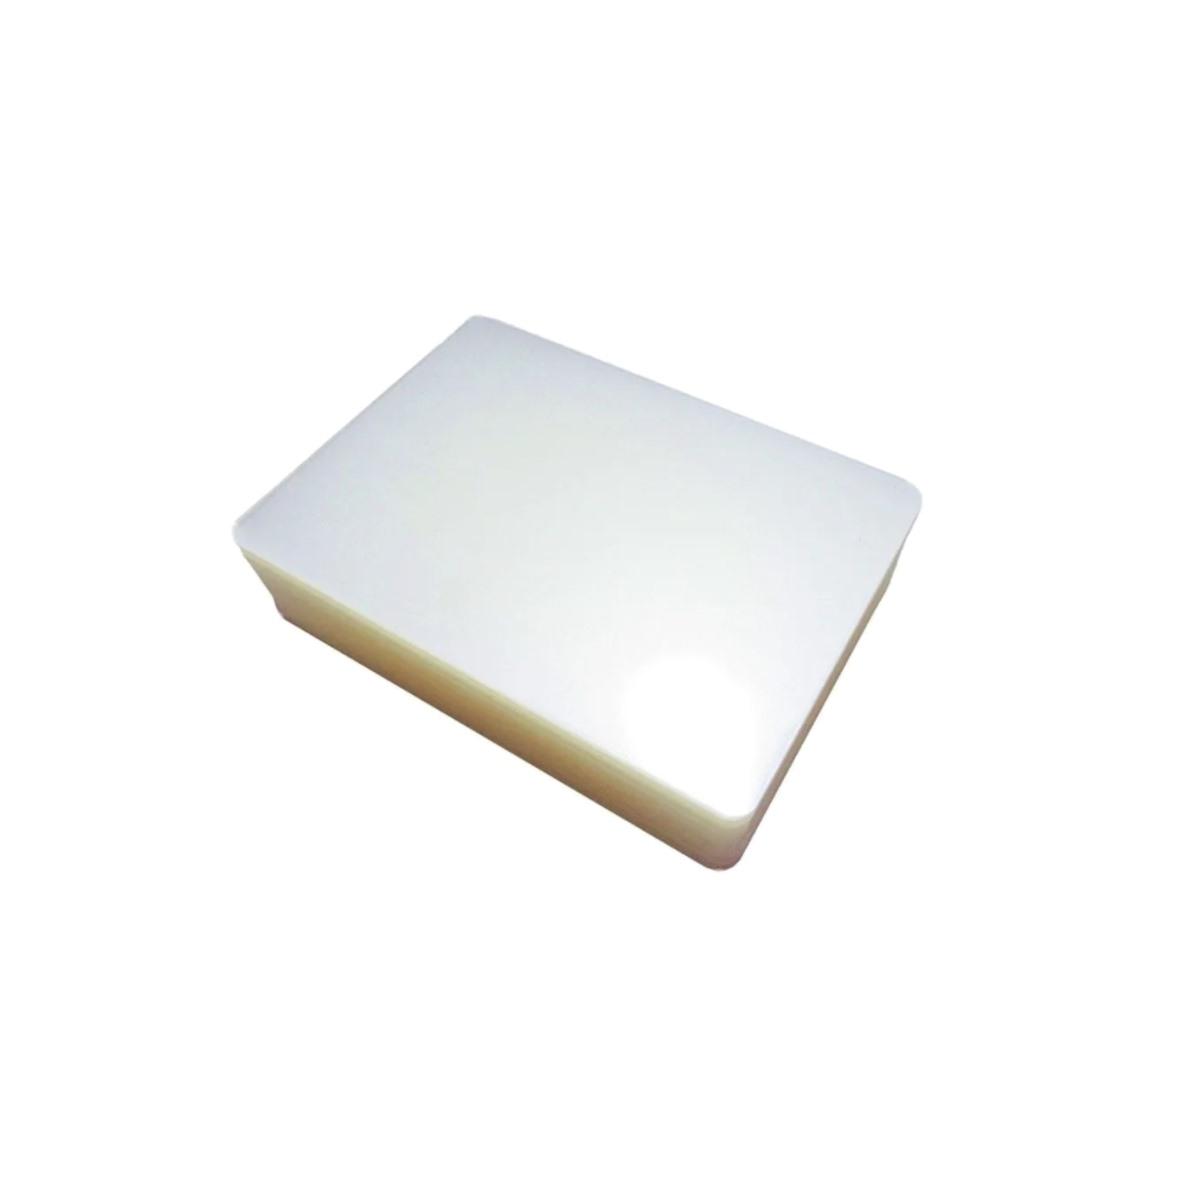 Polaseal plástico para plastificação CIC 60X90 0,10mm 100un